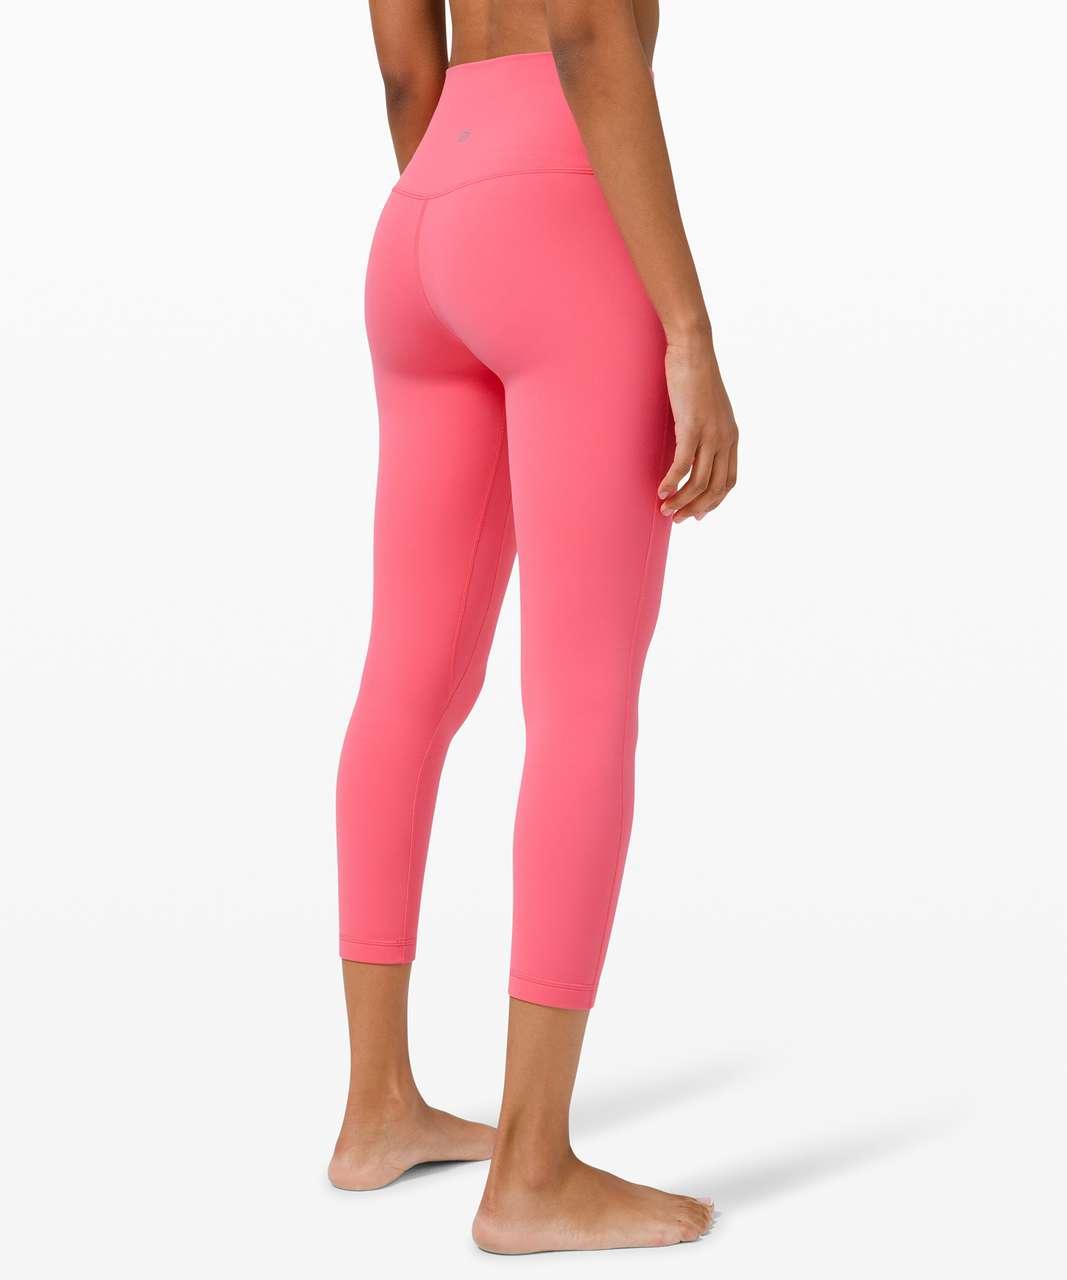 "Lululemon Align Pant 25"" - Guava Pink"